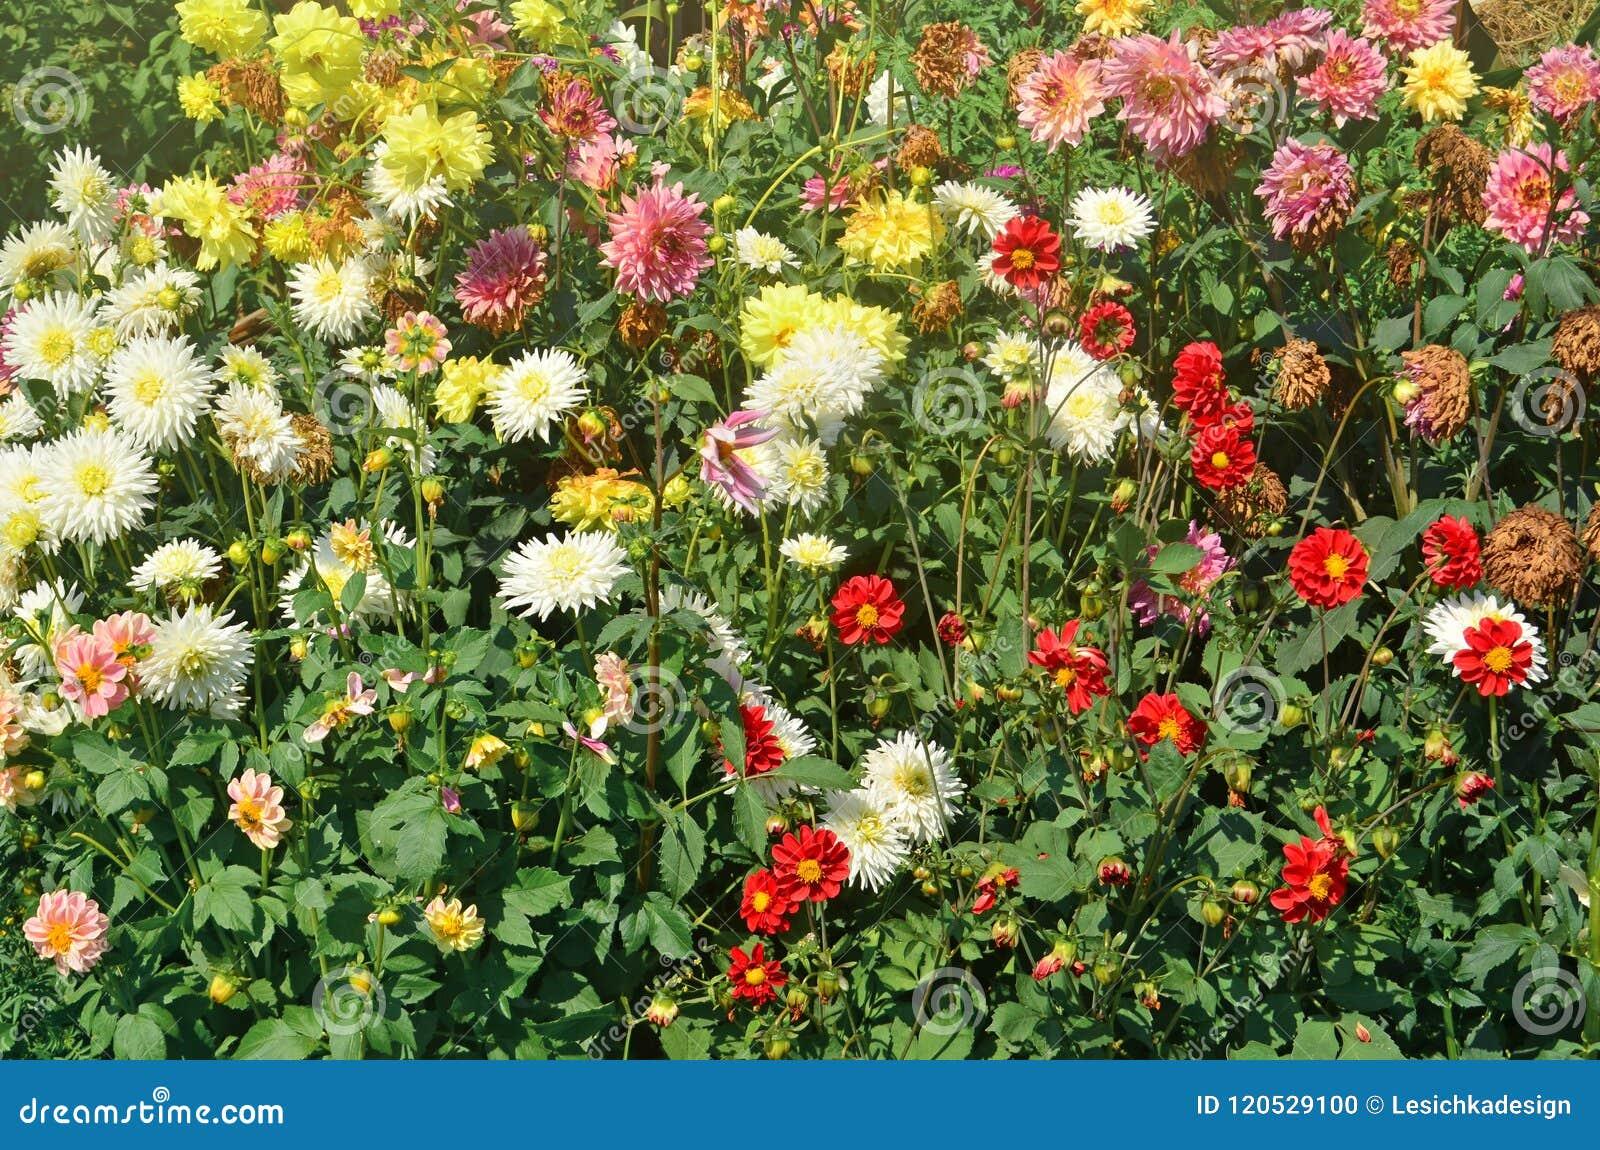 Dahlia Flowers In Garden Stock Photo Image Of Dahlia 120529100